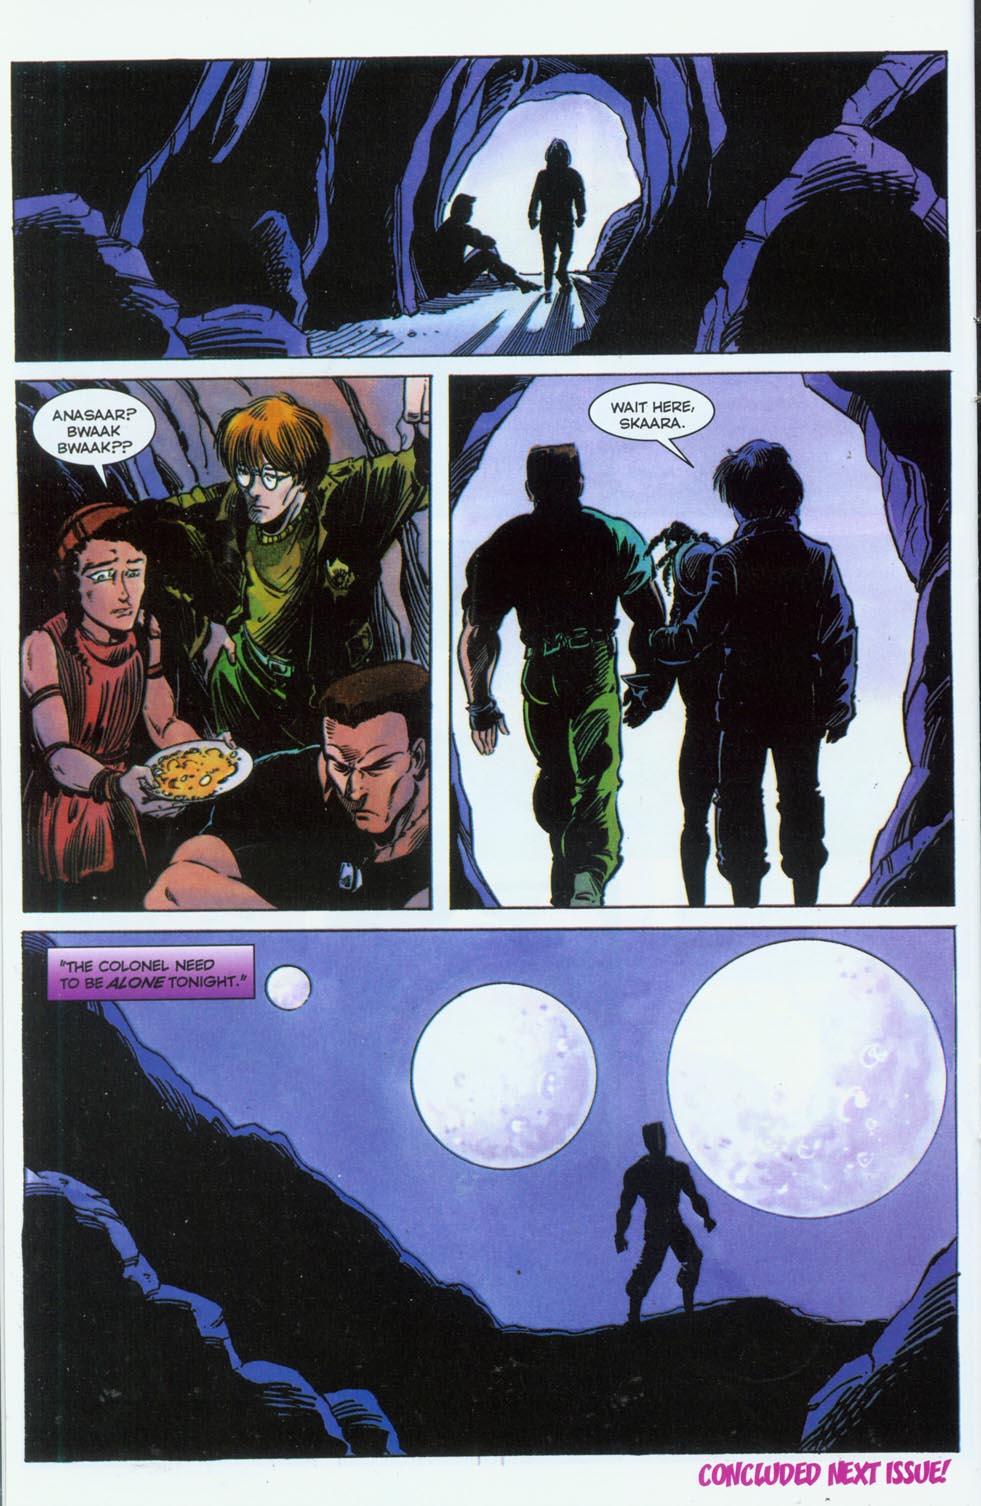 Read online Stargate comic -  Issue #3 - 24